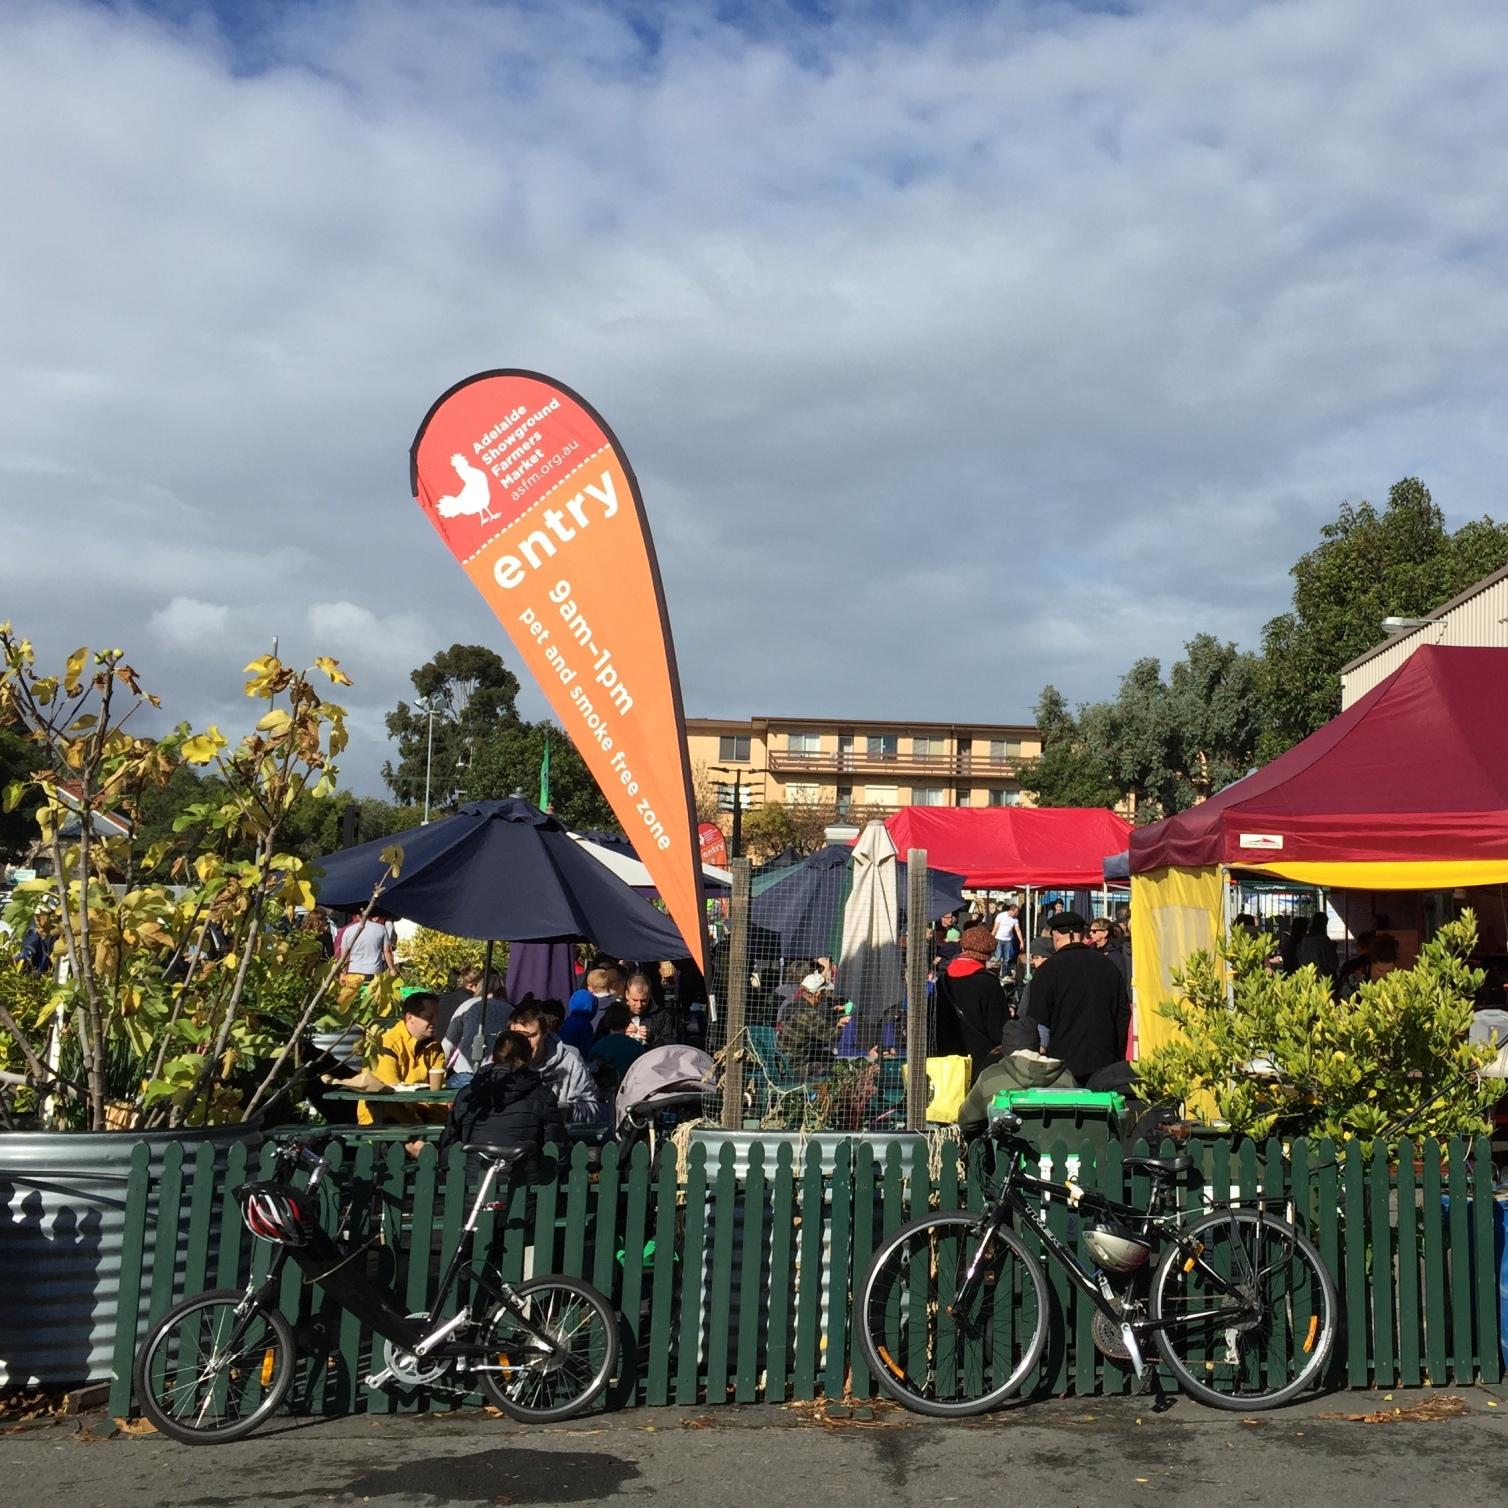 Adelaide farmers market